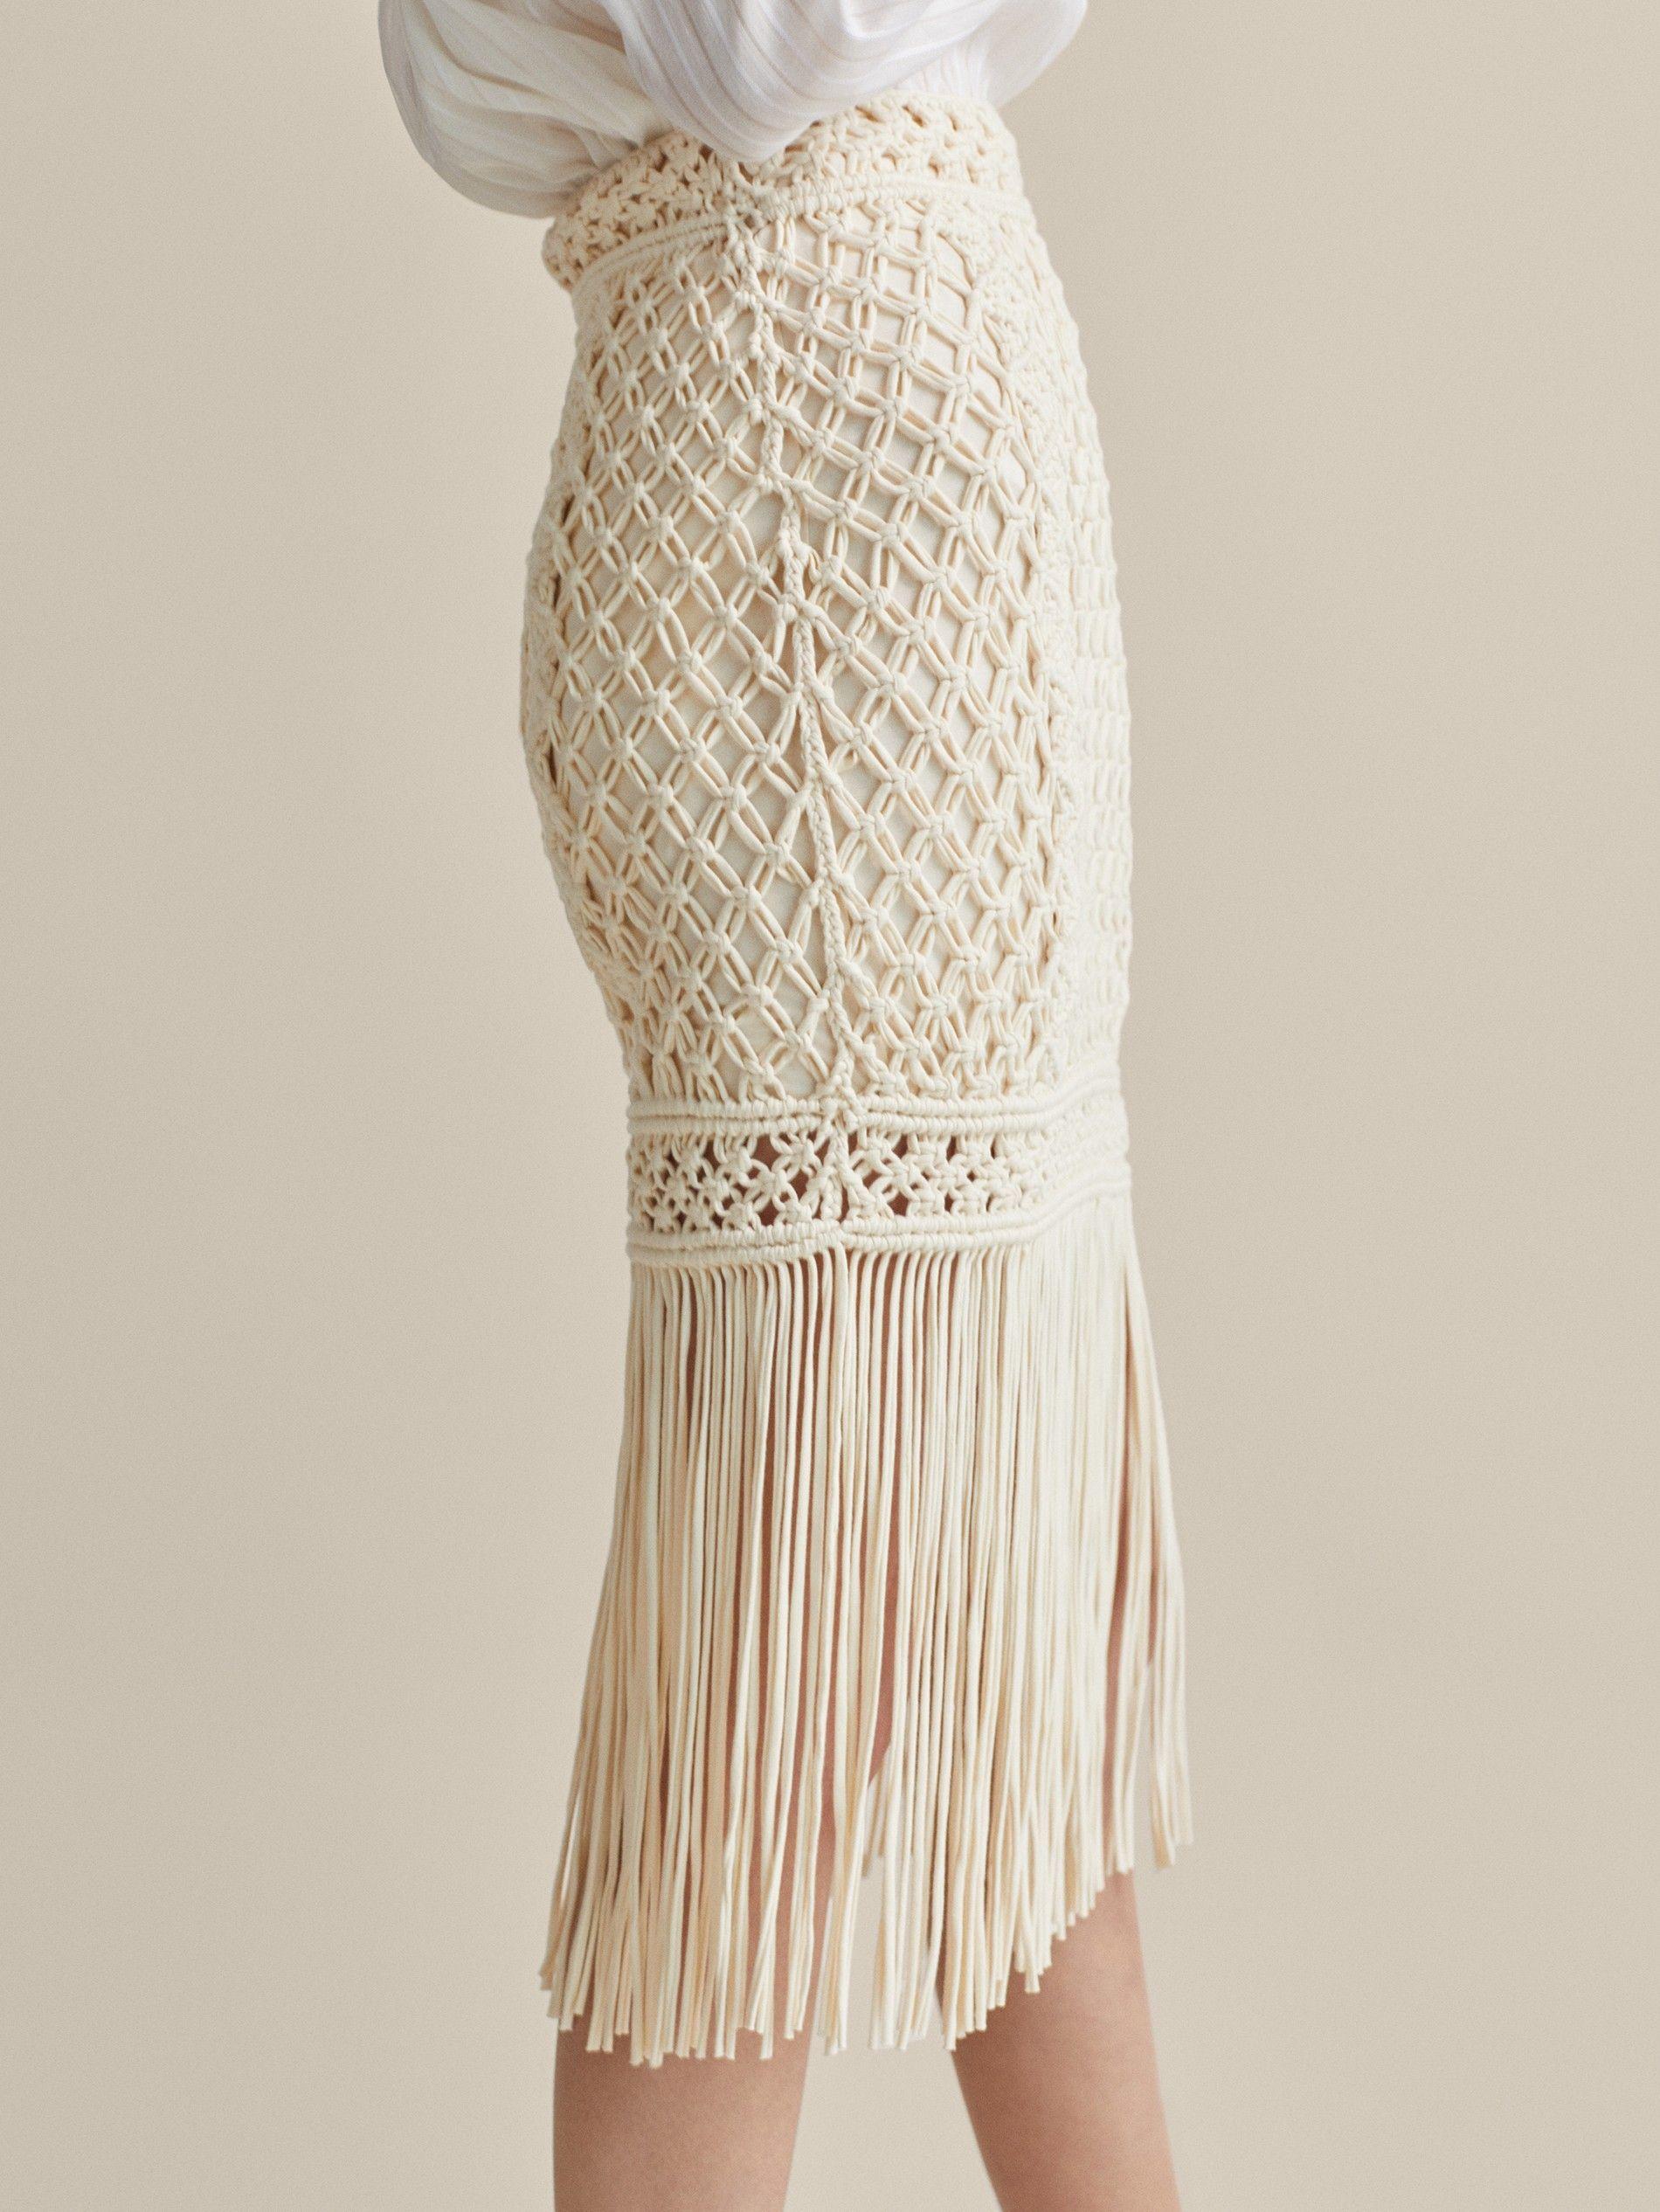 4b8f88a71 La falda midi de Massimo Dutti de crochet más bonita del mundo